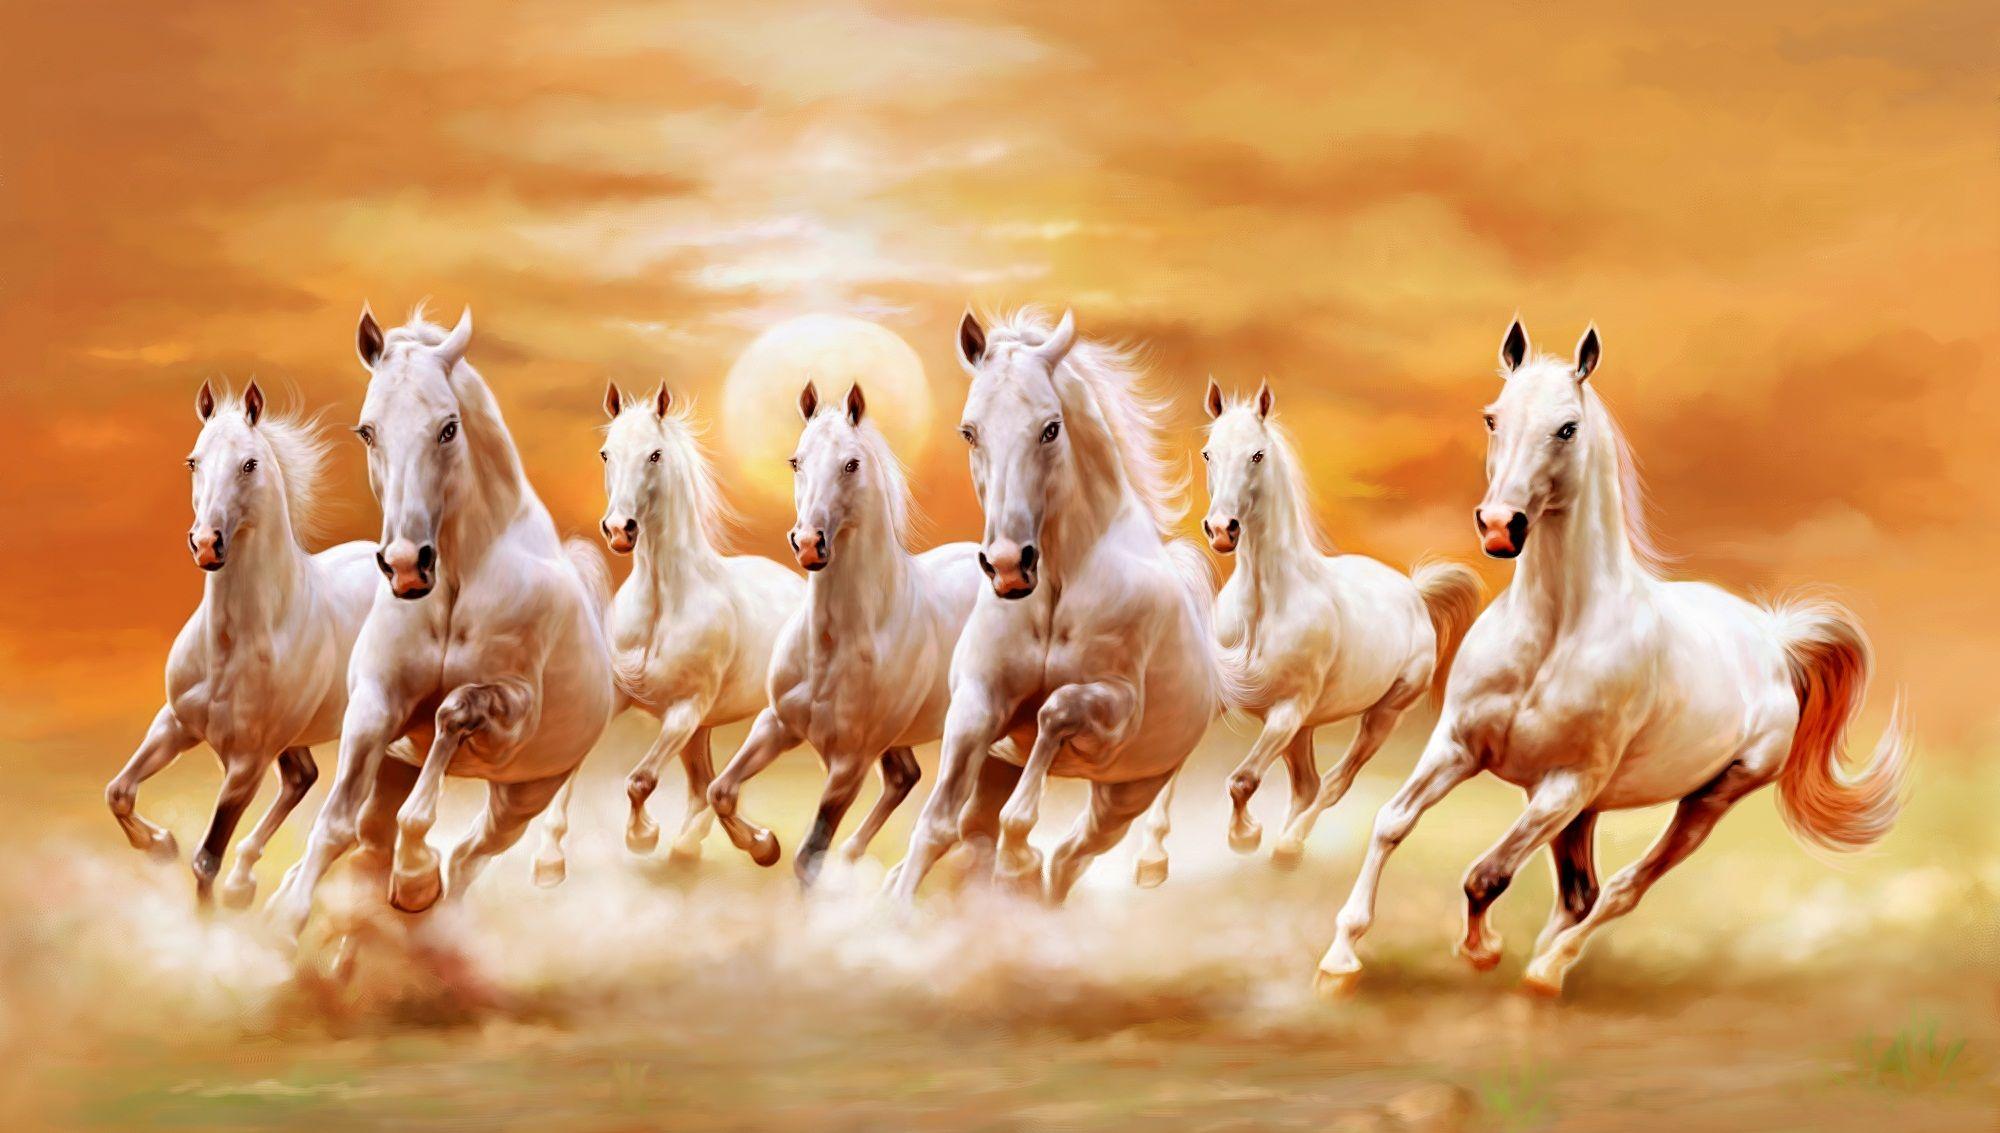 Running Horse HD Wallpaper Horse Images \u2013 Desktop Wallpapers 2000x1133